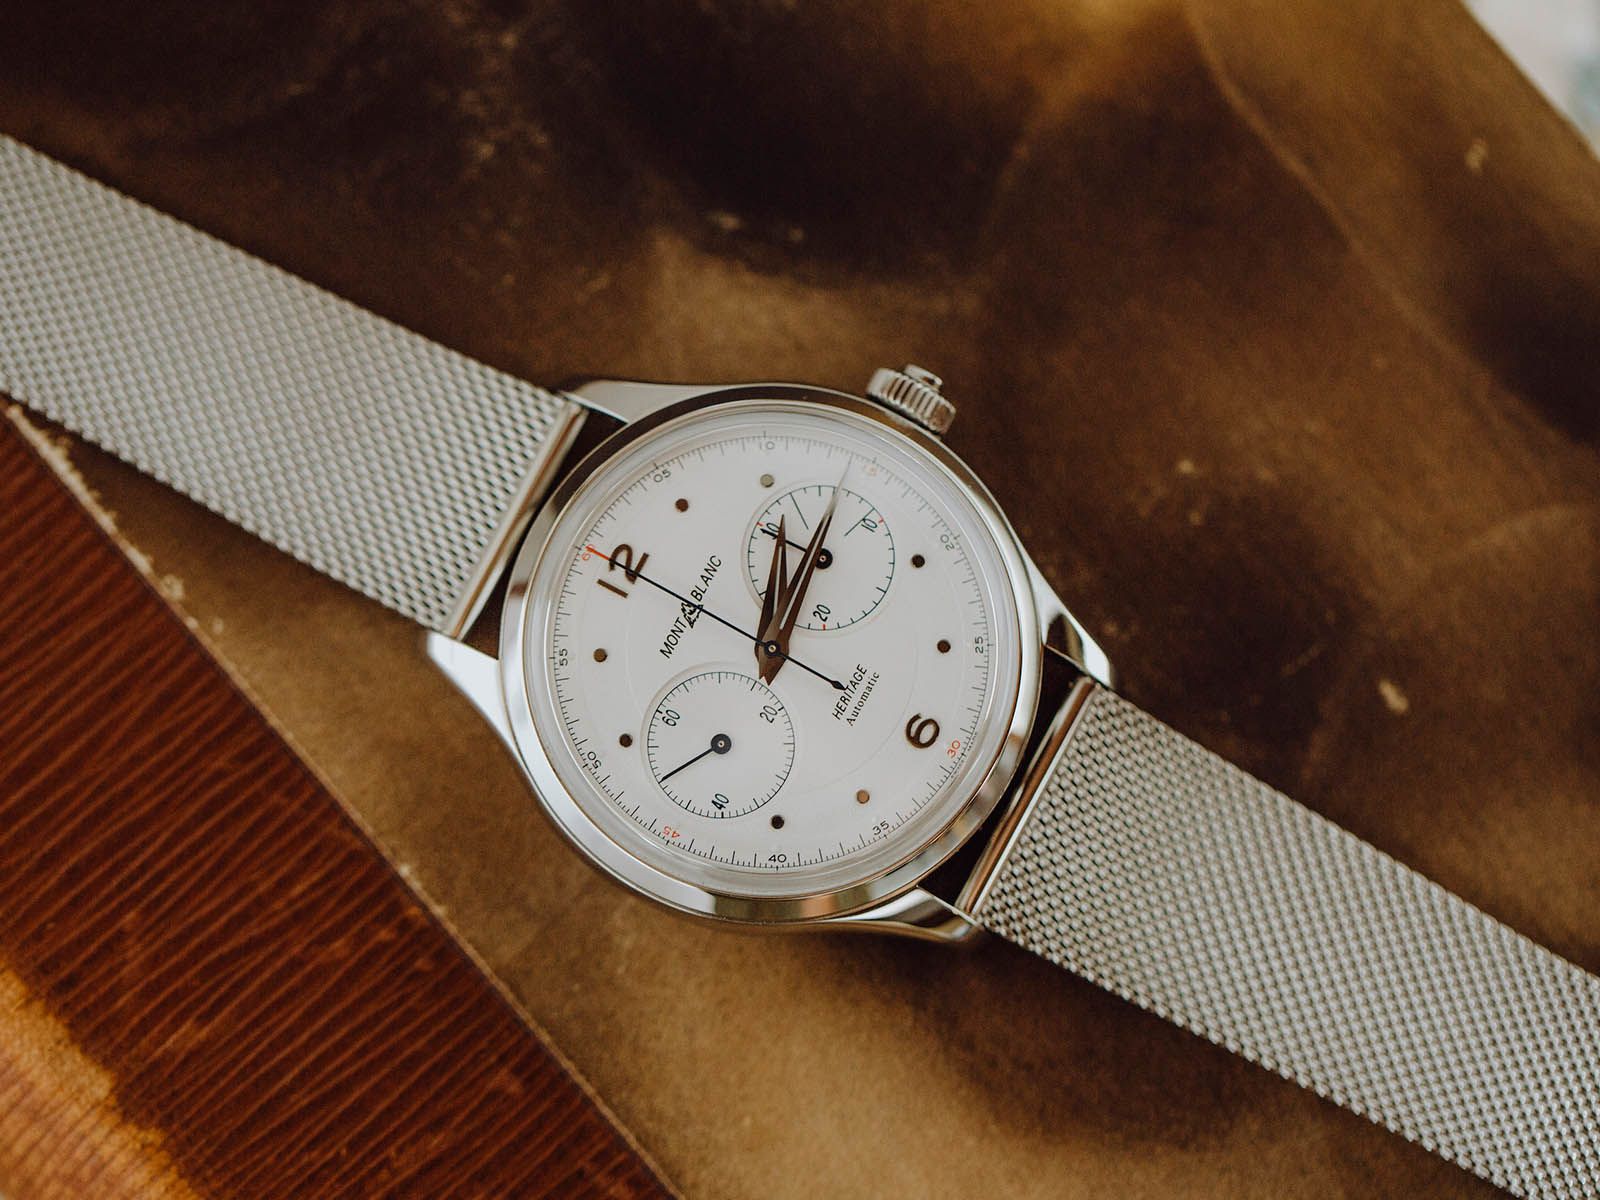 montblanc-heritage-monopusher-chronograph-2.jpg